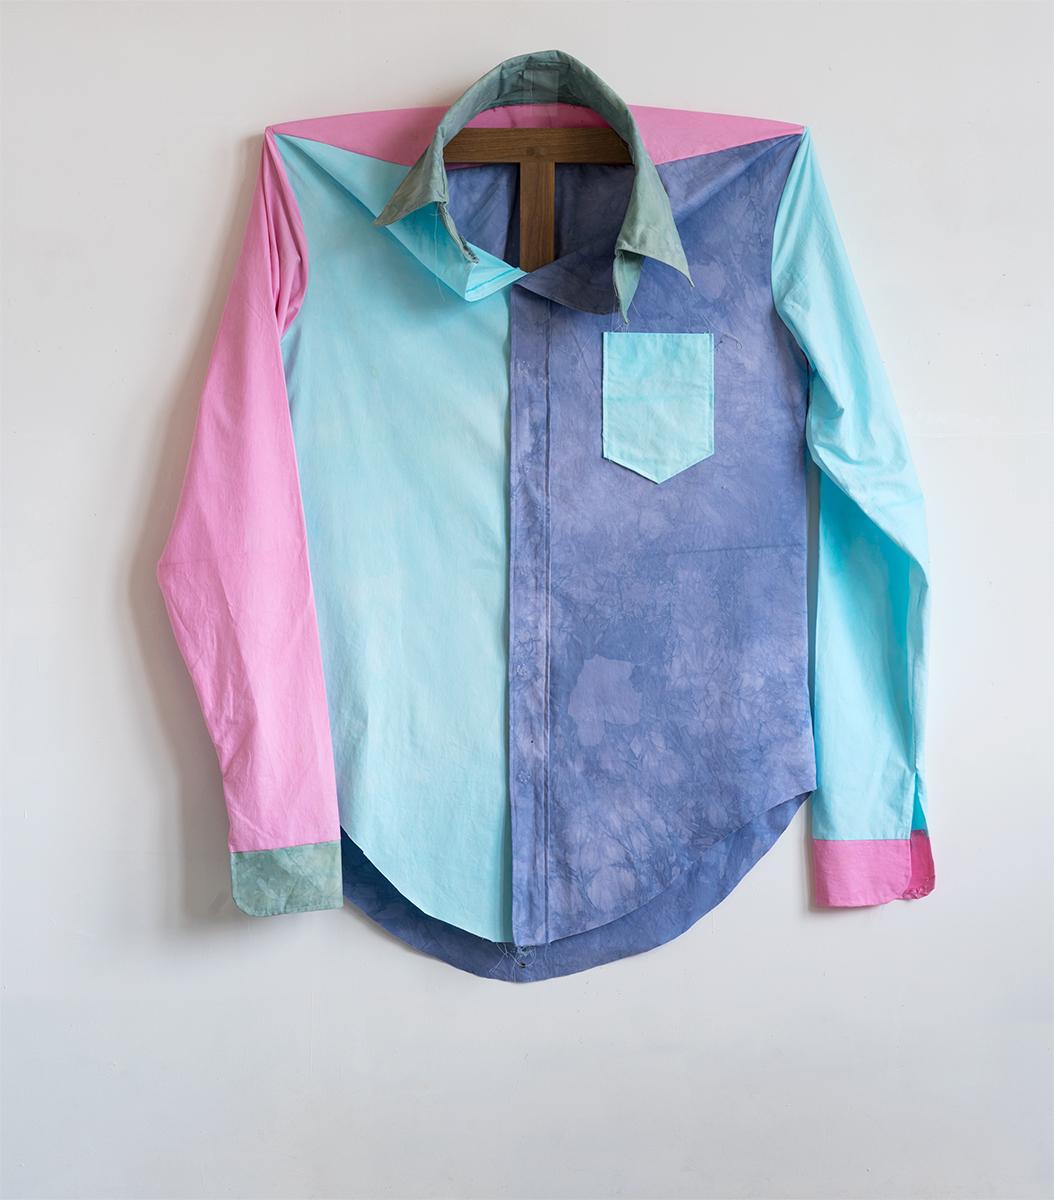 Color Block Shirt, 2015 157,5 x 139,7 x 31 cm Cotton on Walnut Frame